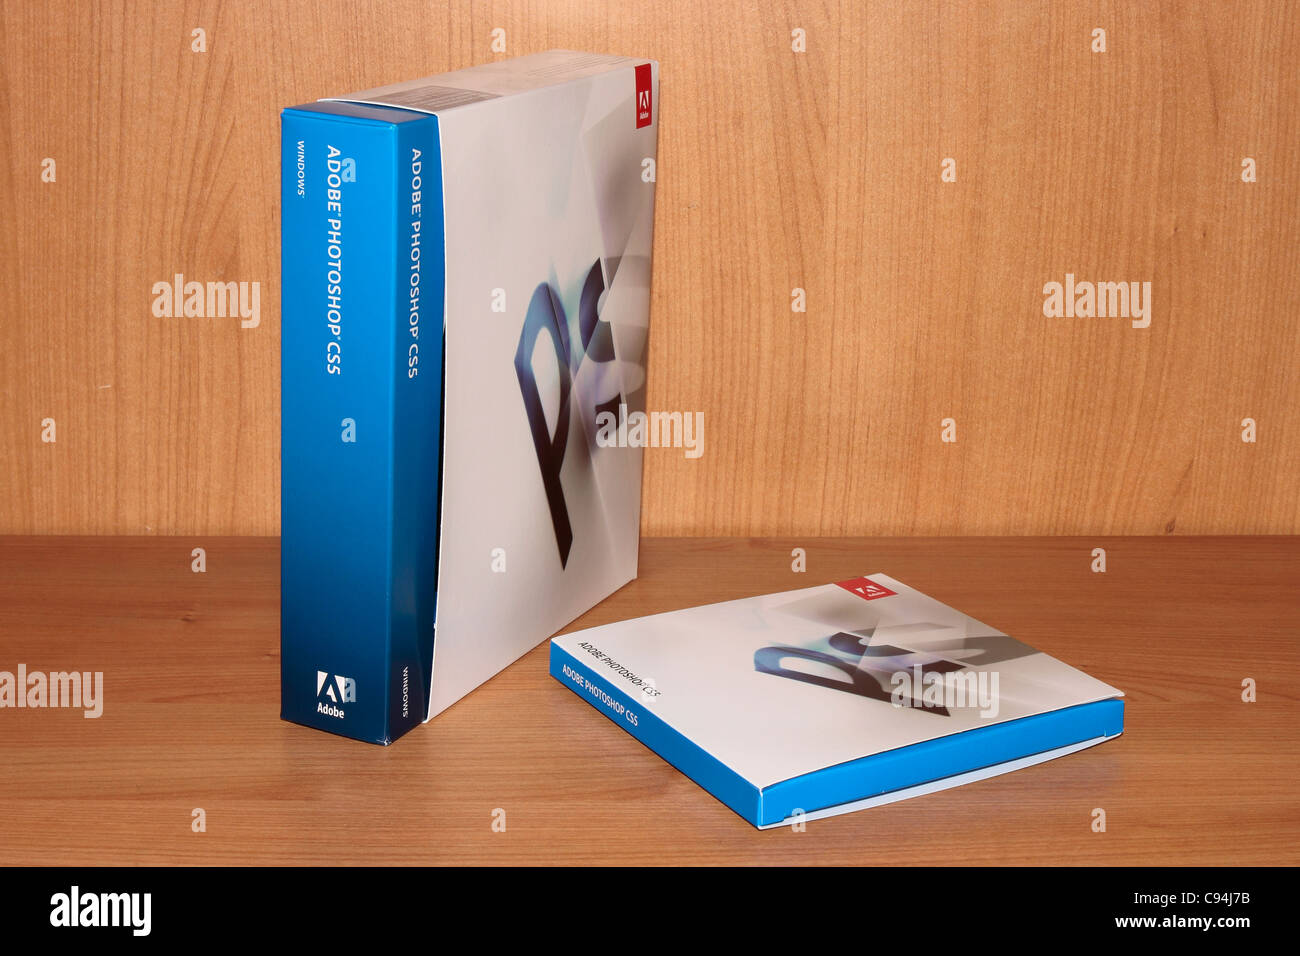 Adobe Photoshop CS5 Box - Stock Image